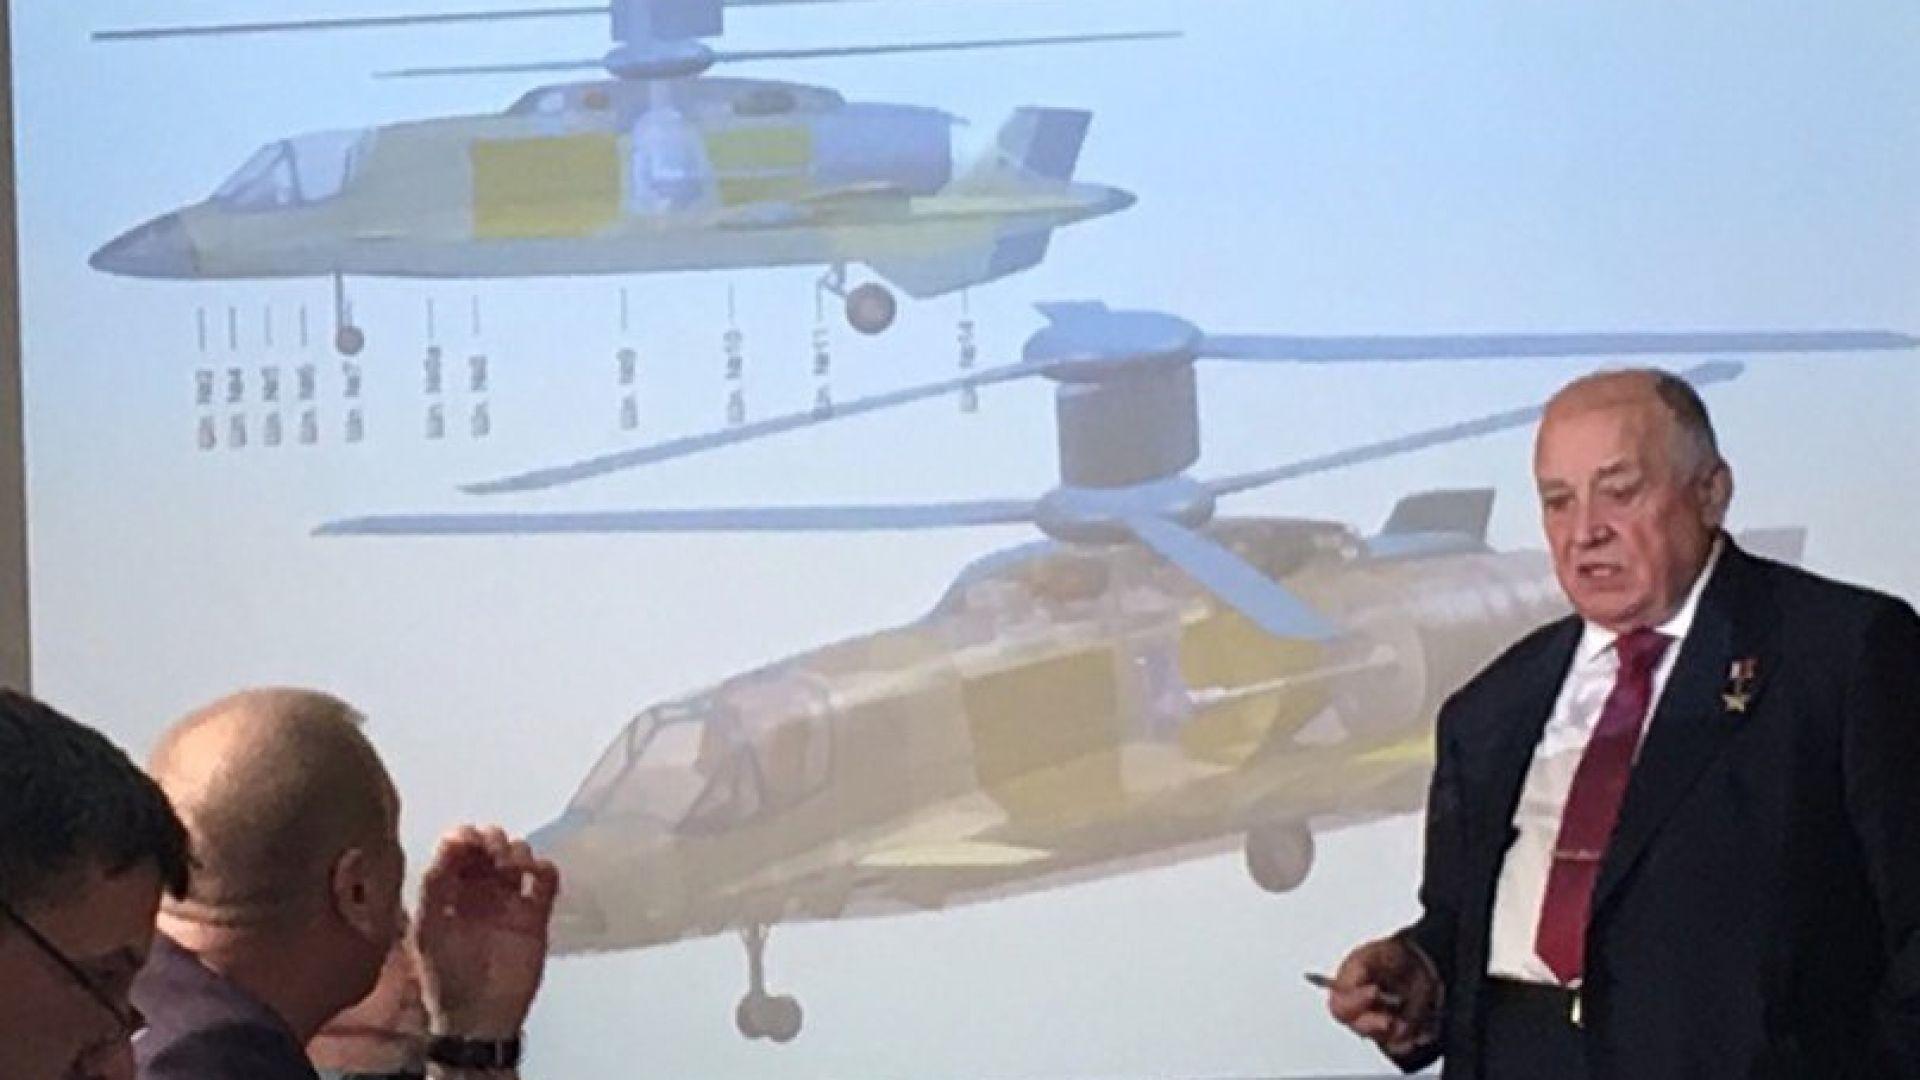 Руски хеликоптер ще вдига 700 км/ч